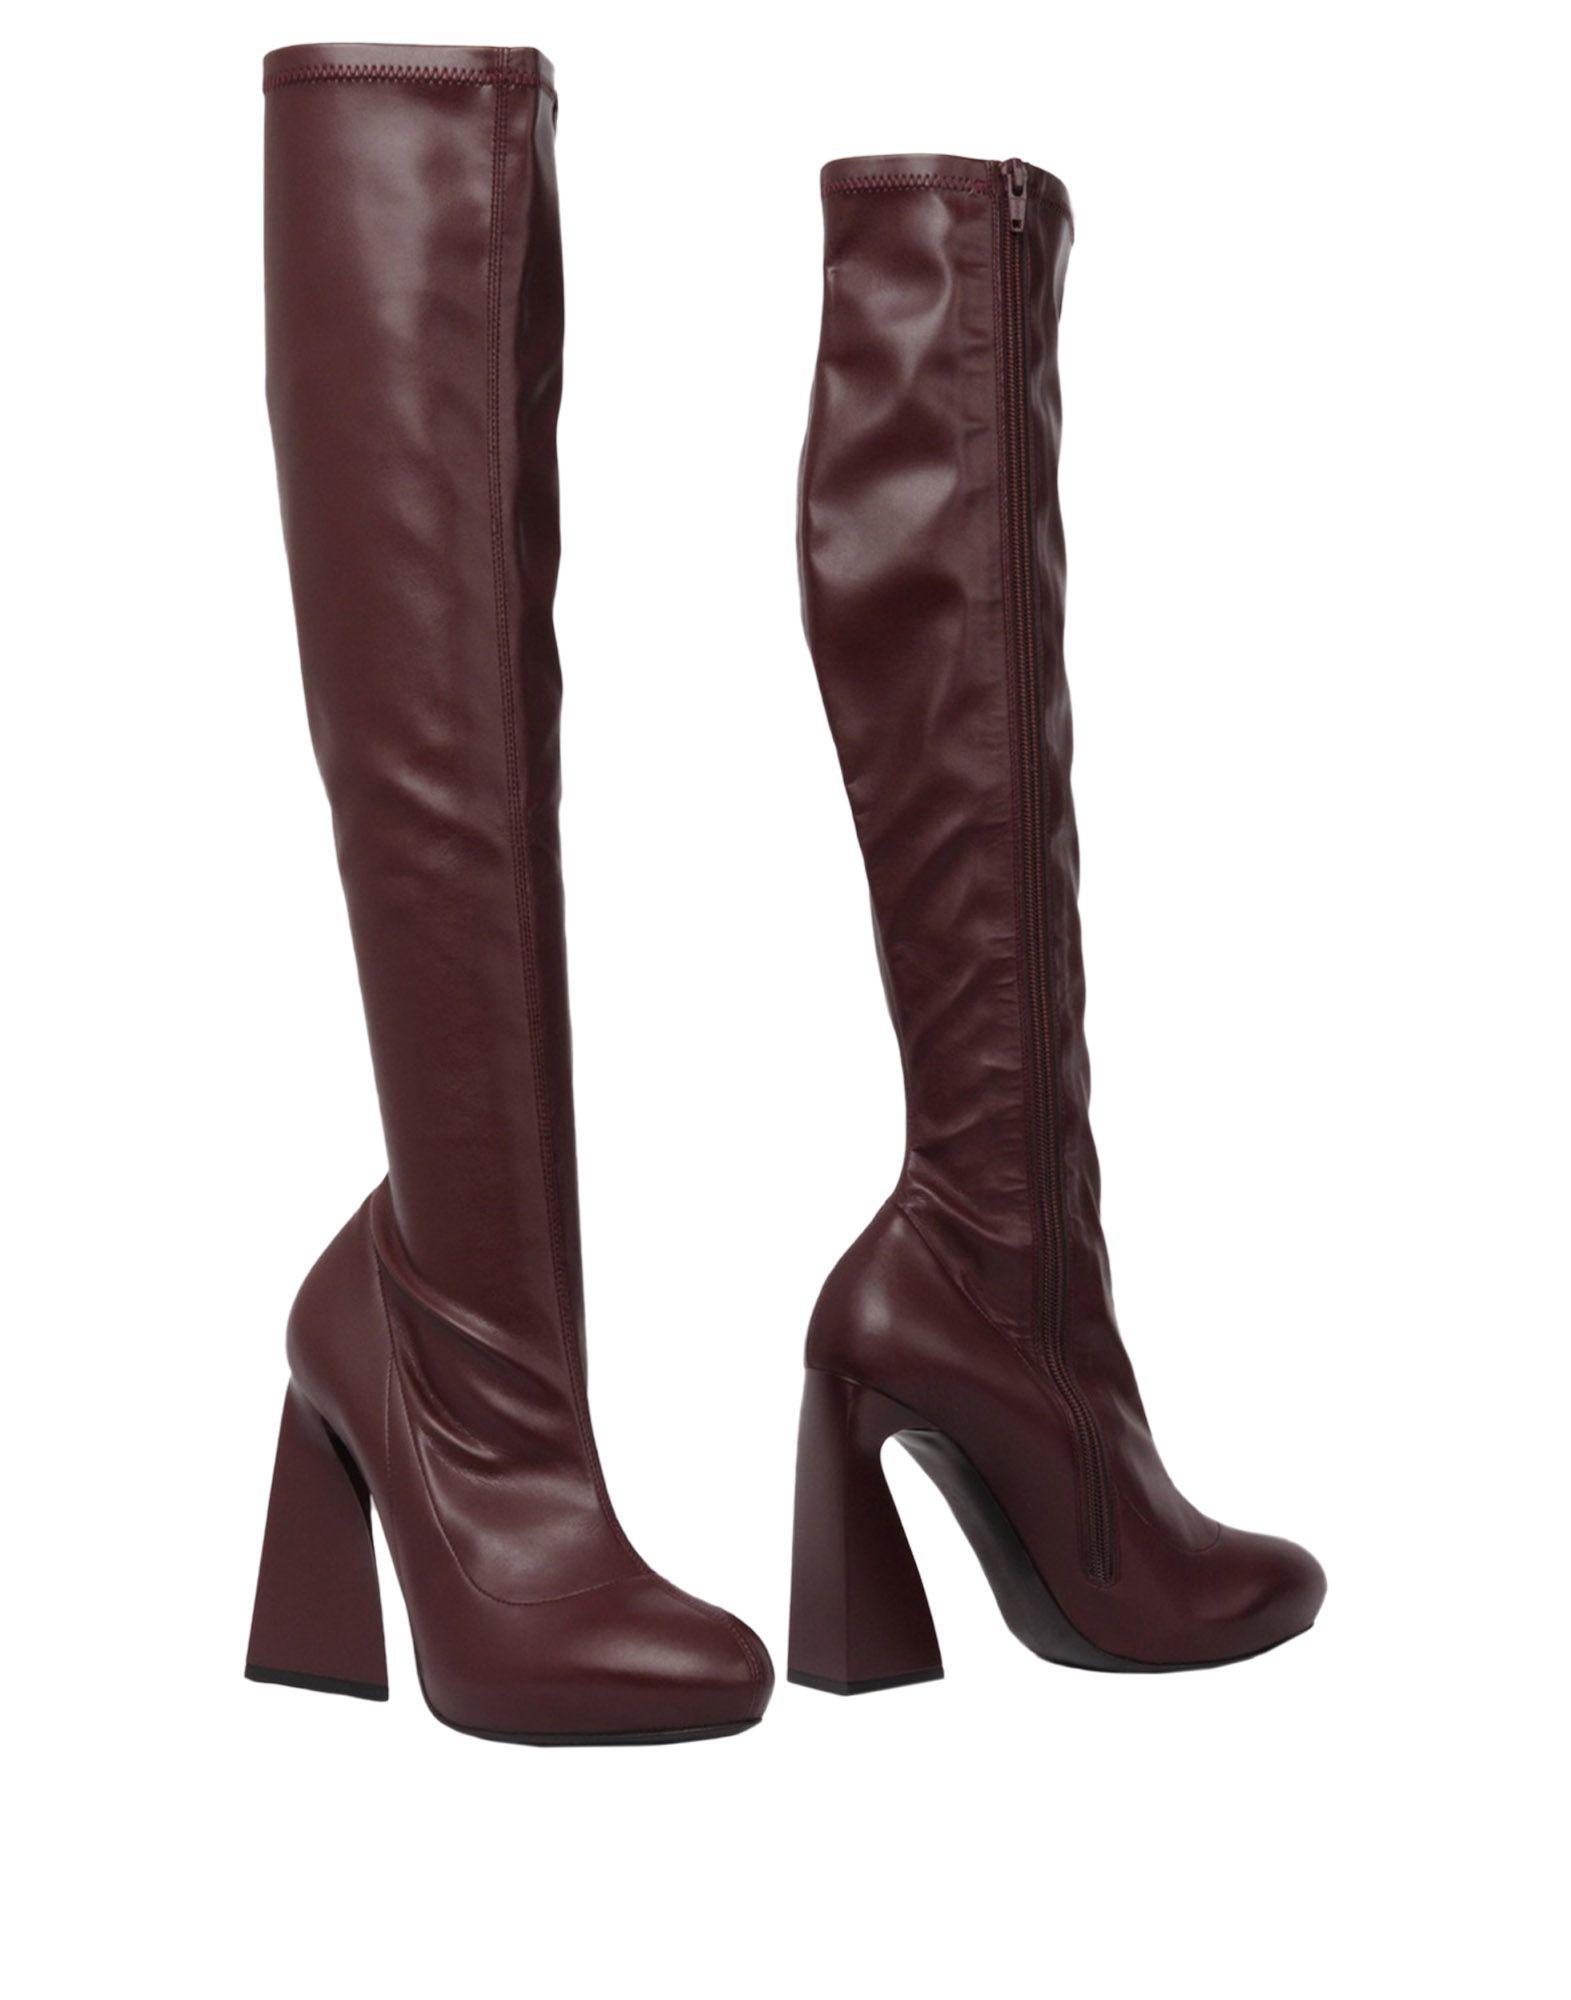 Stella Mccartney Boots - Women Stella Mccartney Australia Boots online on  Australia Mccartney - 11079611TA 88a496